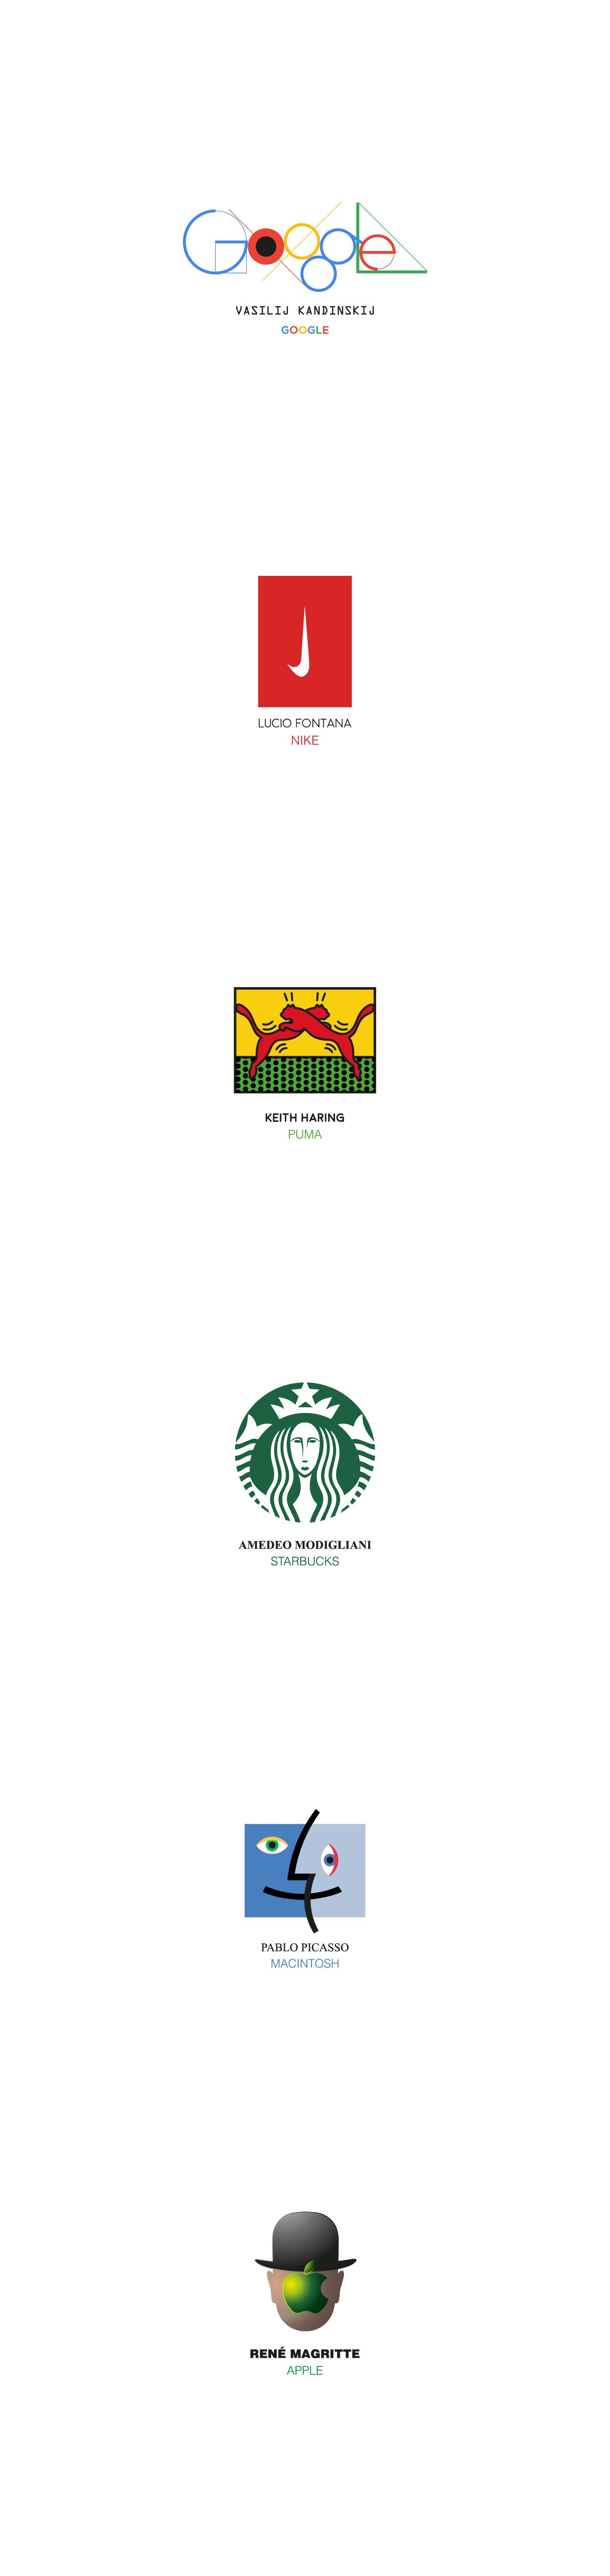 logo brand google Nike puma mac Macintosh pepsi sturbucks apple minimal painters artist famous inspiration